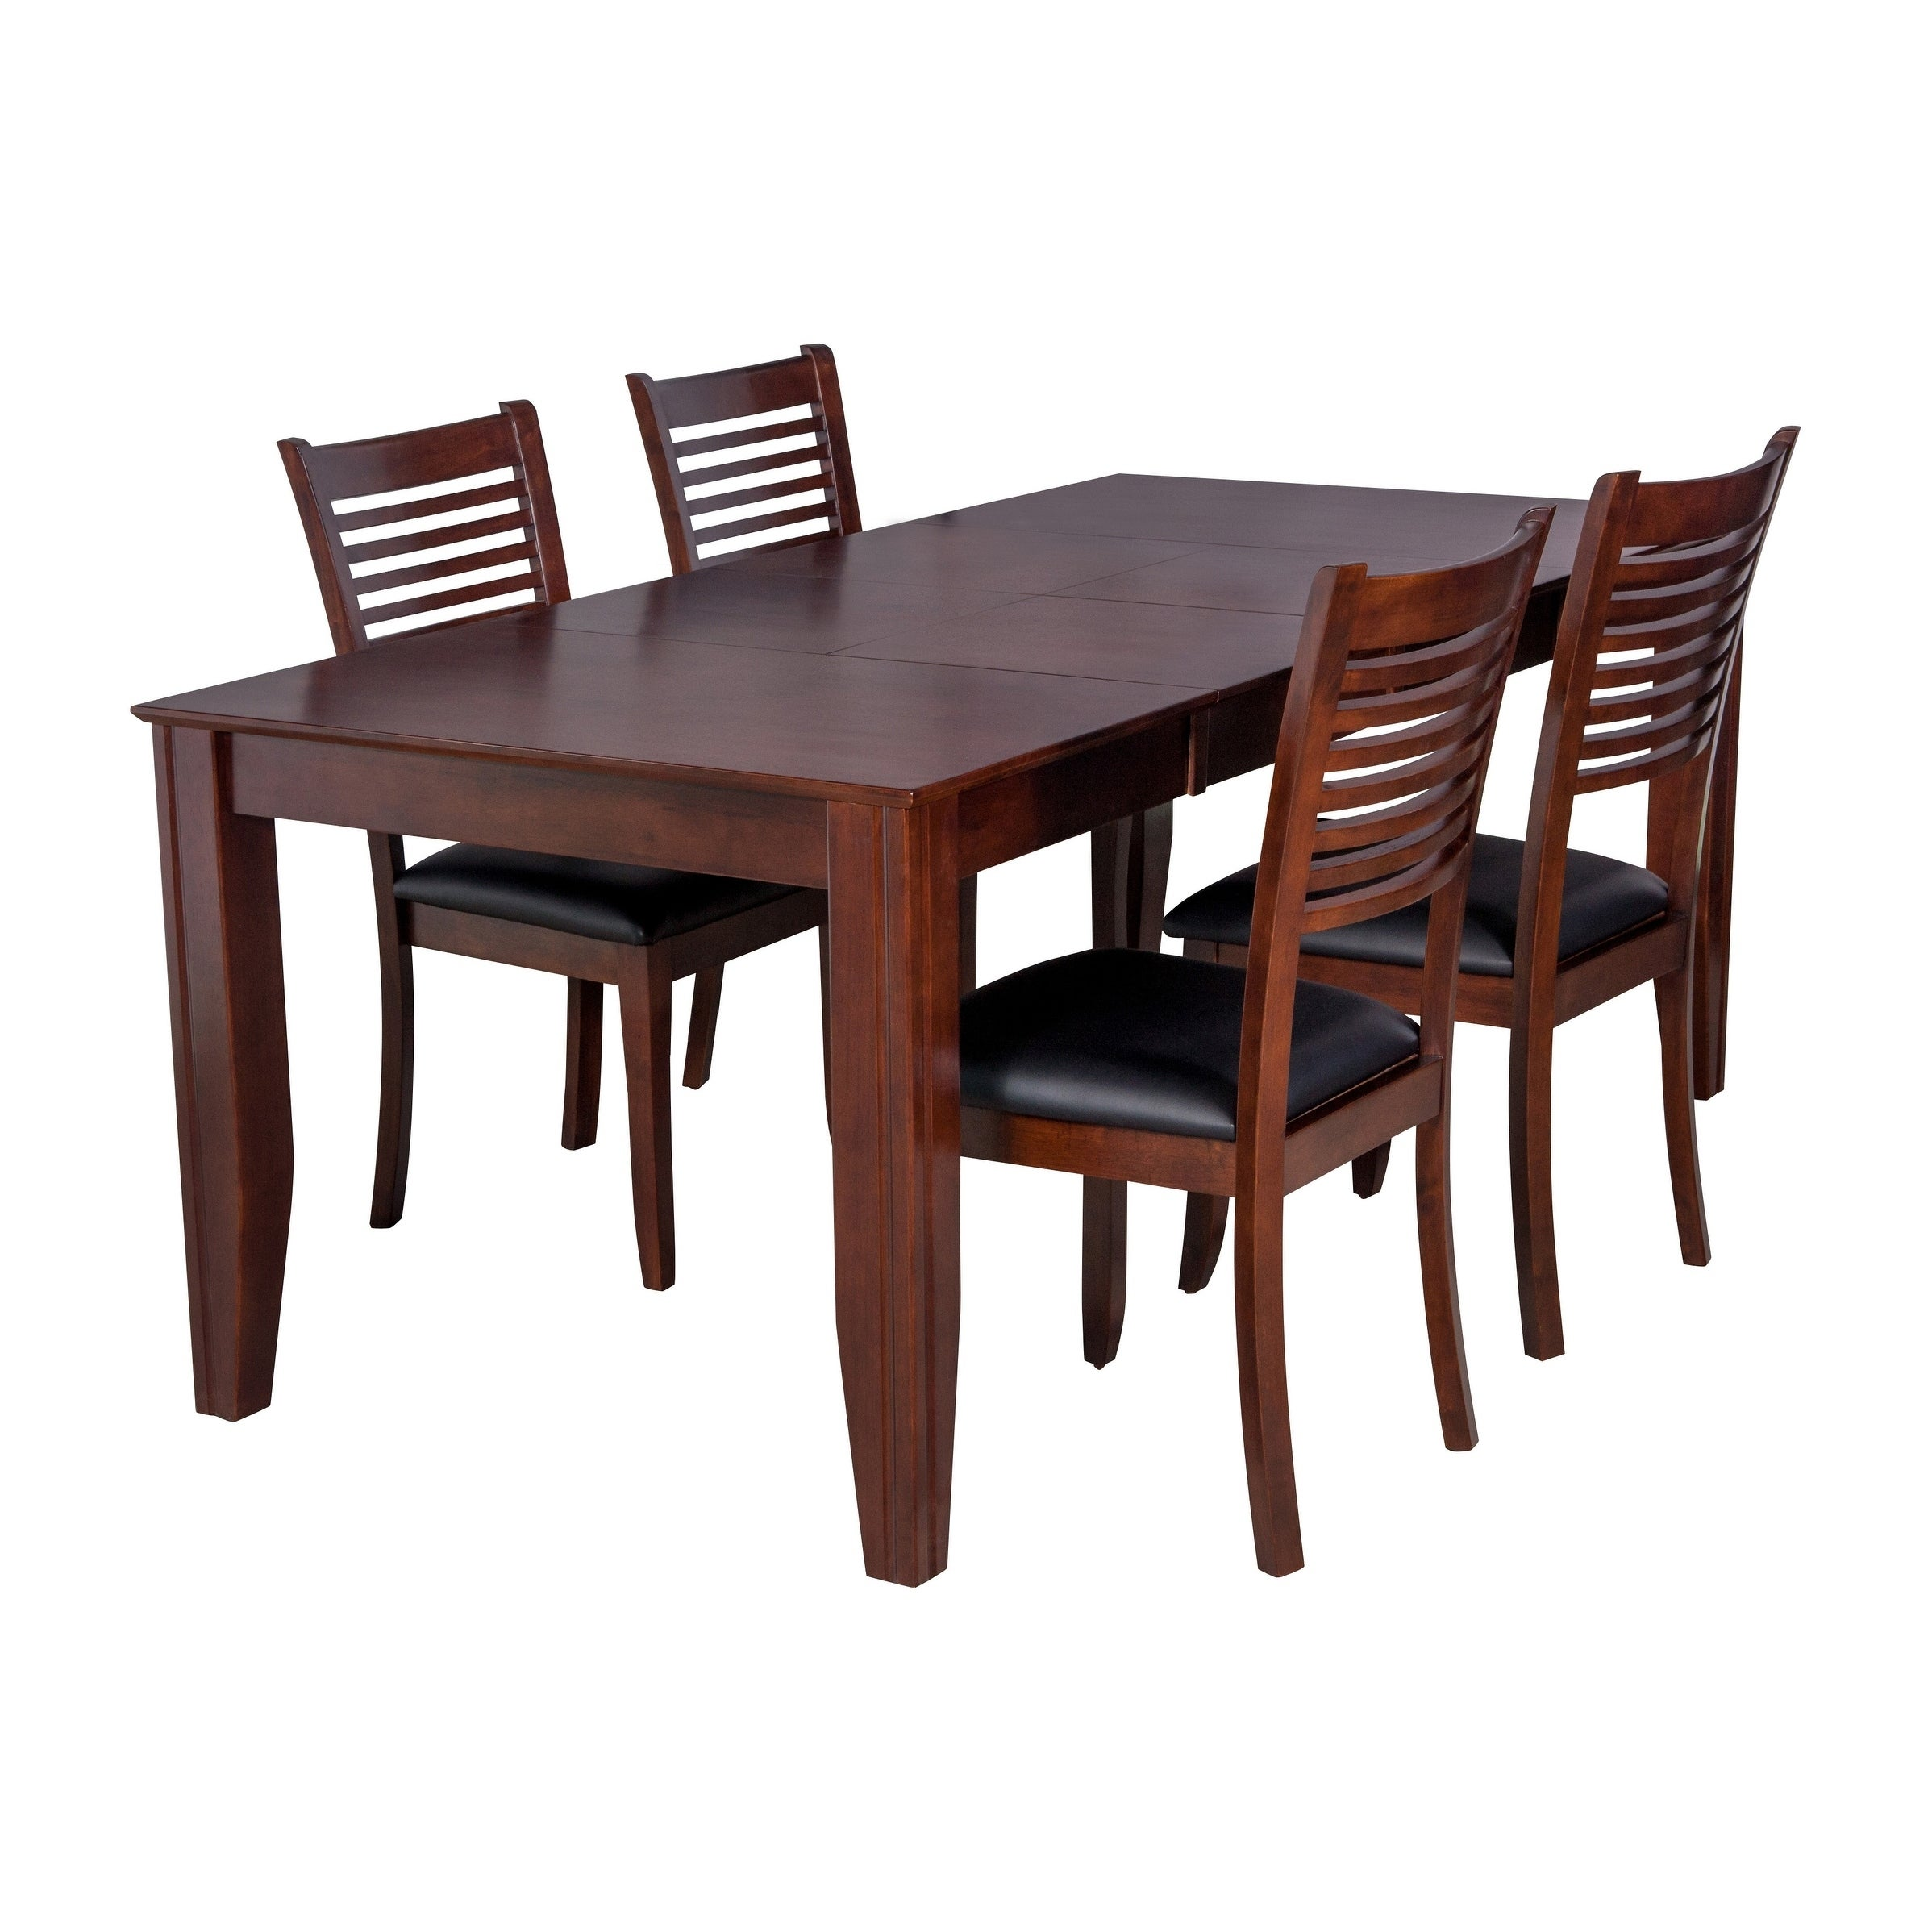 5 Piece Solid Wood Dining Set Charlotte Modern Kitchen Table Set Espresso Overstock 17853619